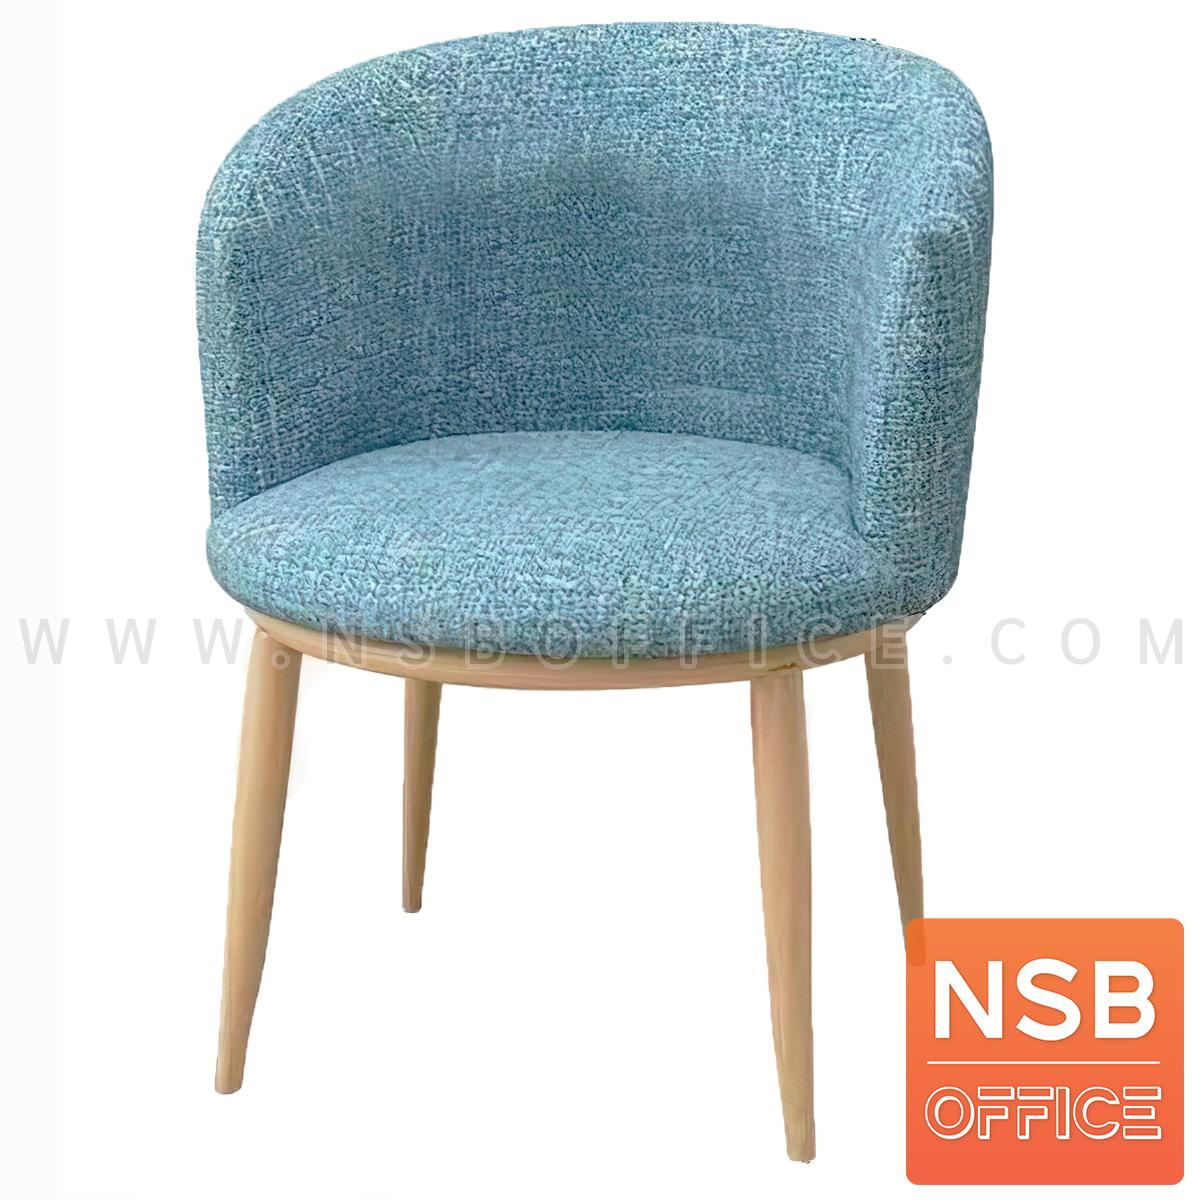 B29A378:เก้าอี้โมเดิร์นหุ้มผ้า รุ่น fabbrick (แฟ็บบริค)  ขาไม้